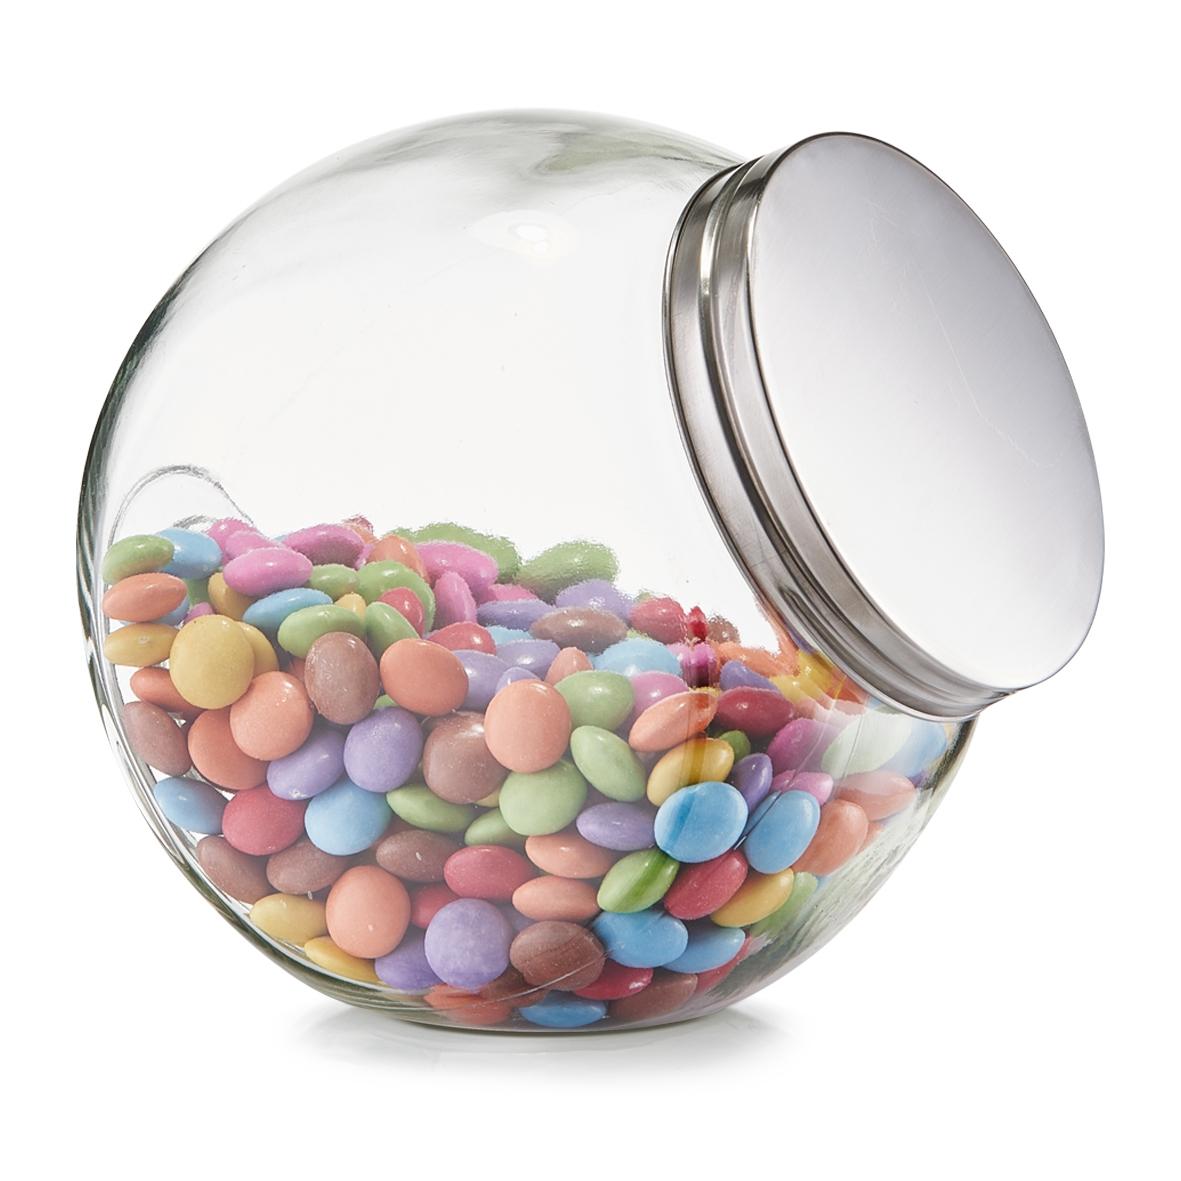 Borcan pentru depozitare din sticla Candy, capac metalic, 1200 ml, l15xA10,5xH15 cm imagine